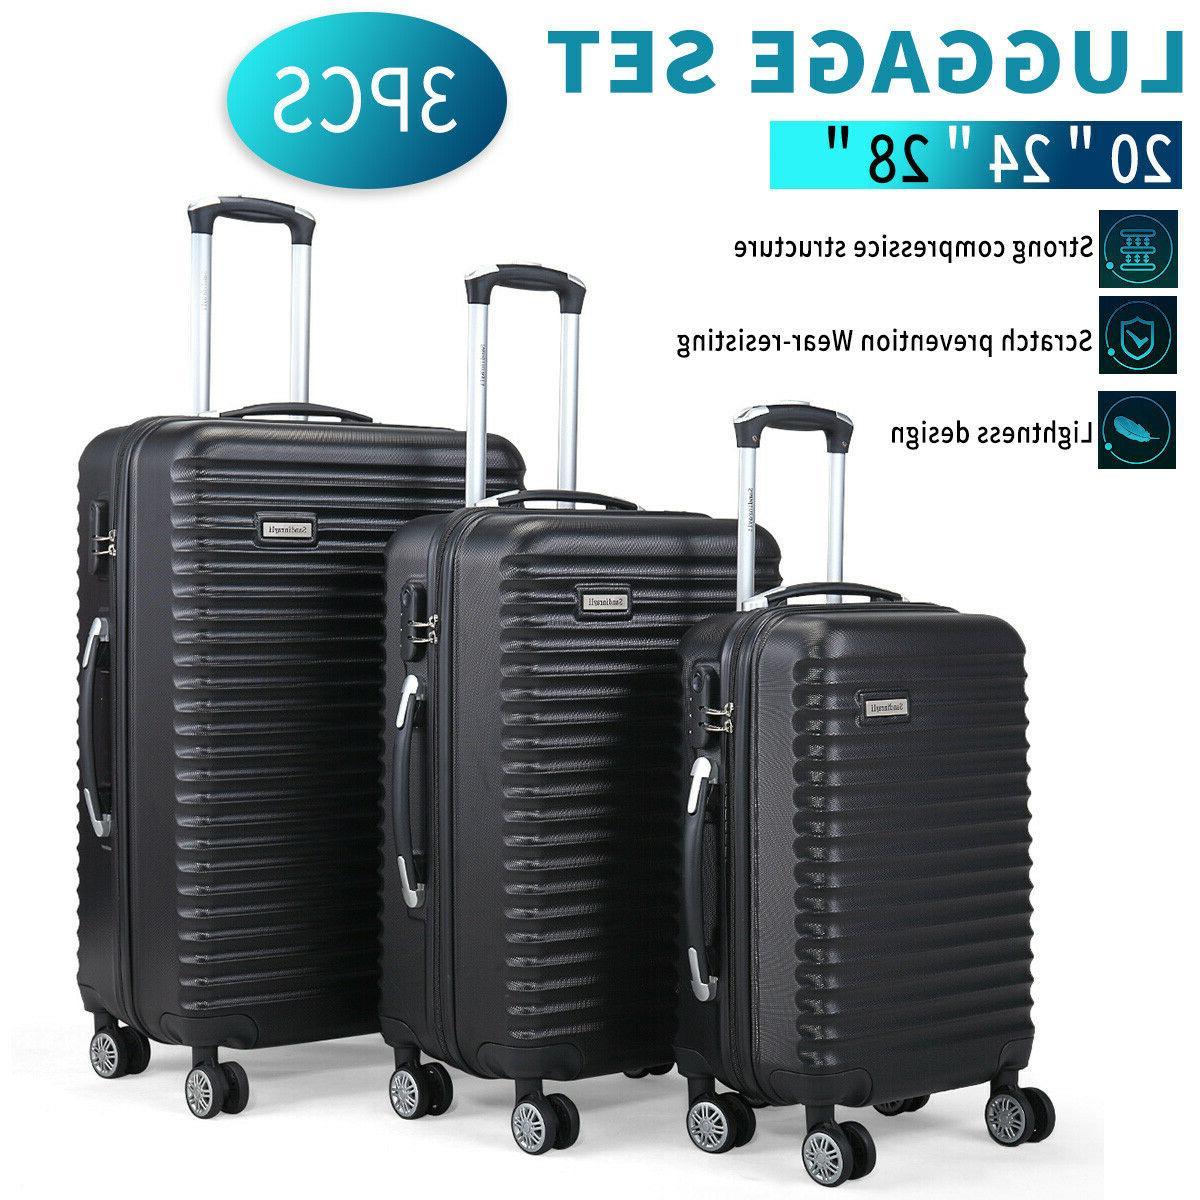 3 pcs set luggage travel bag carry